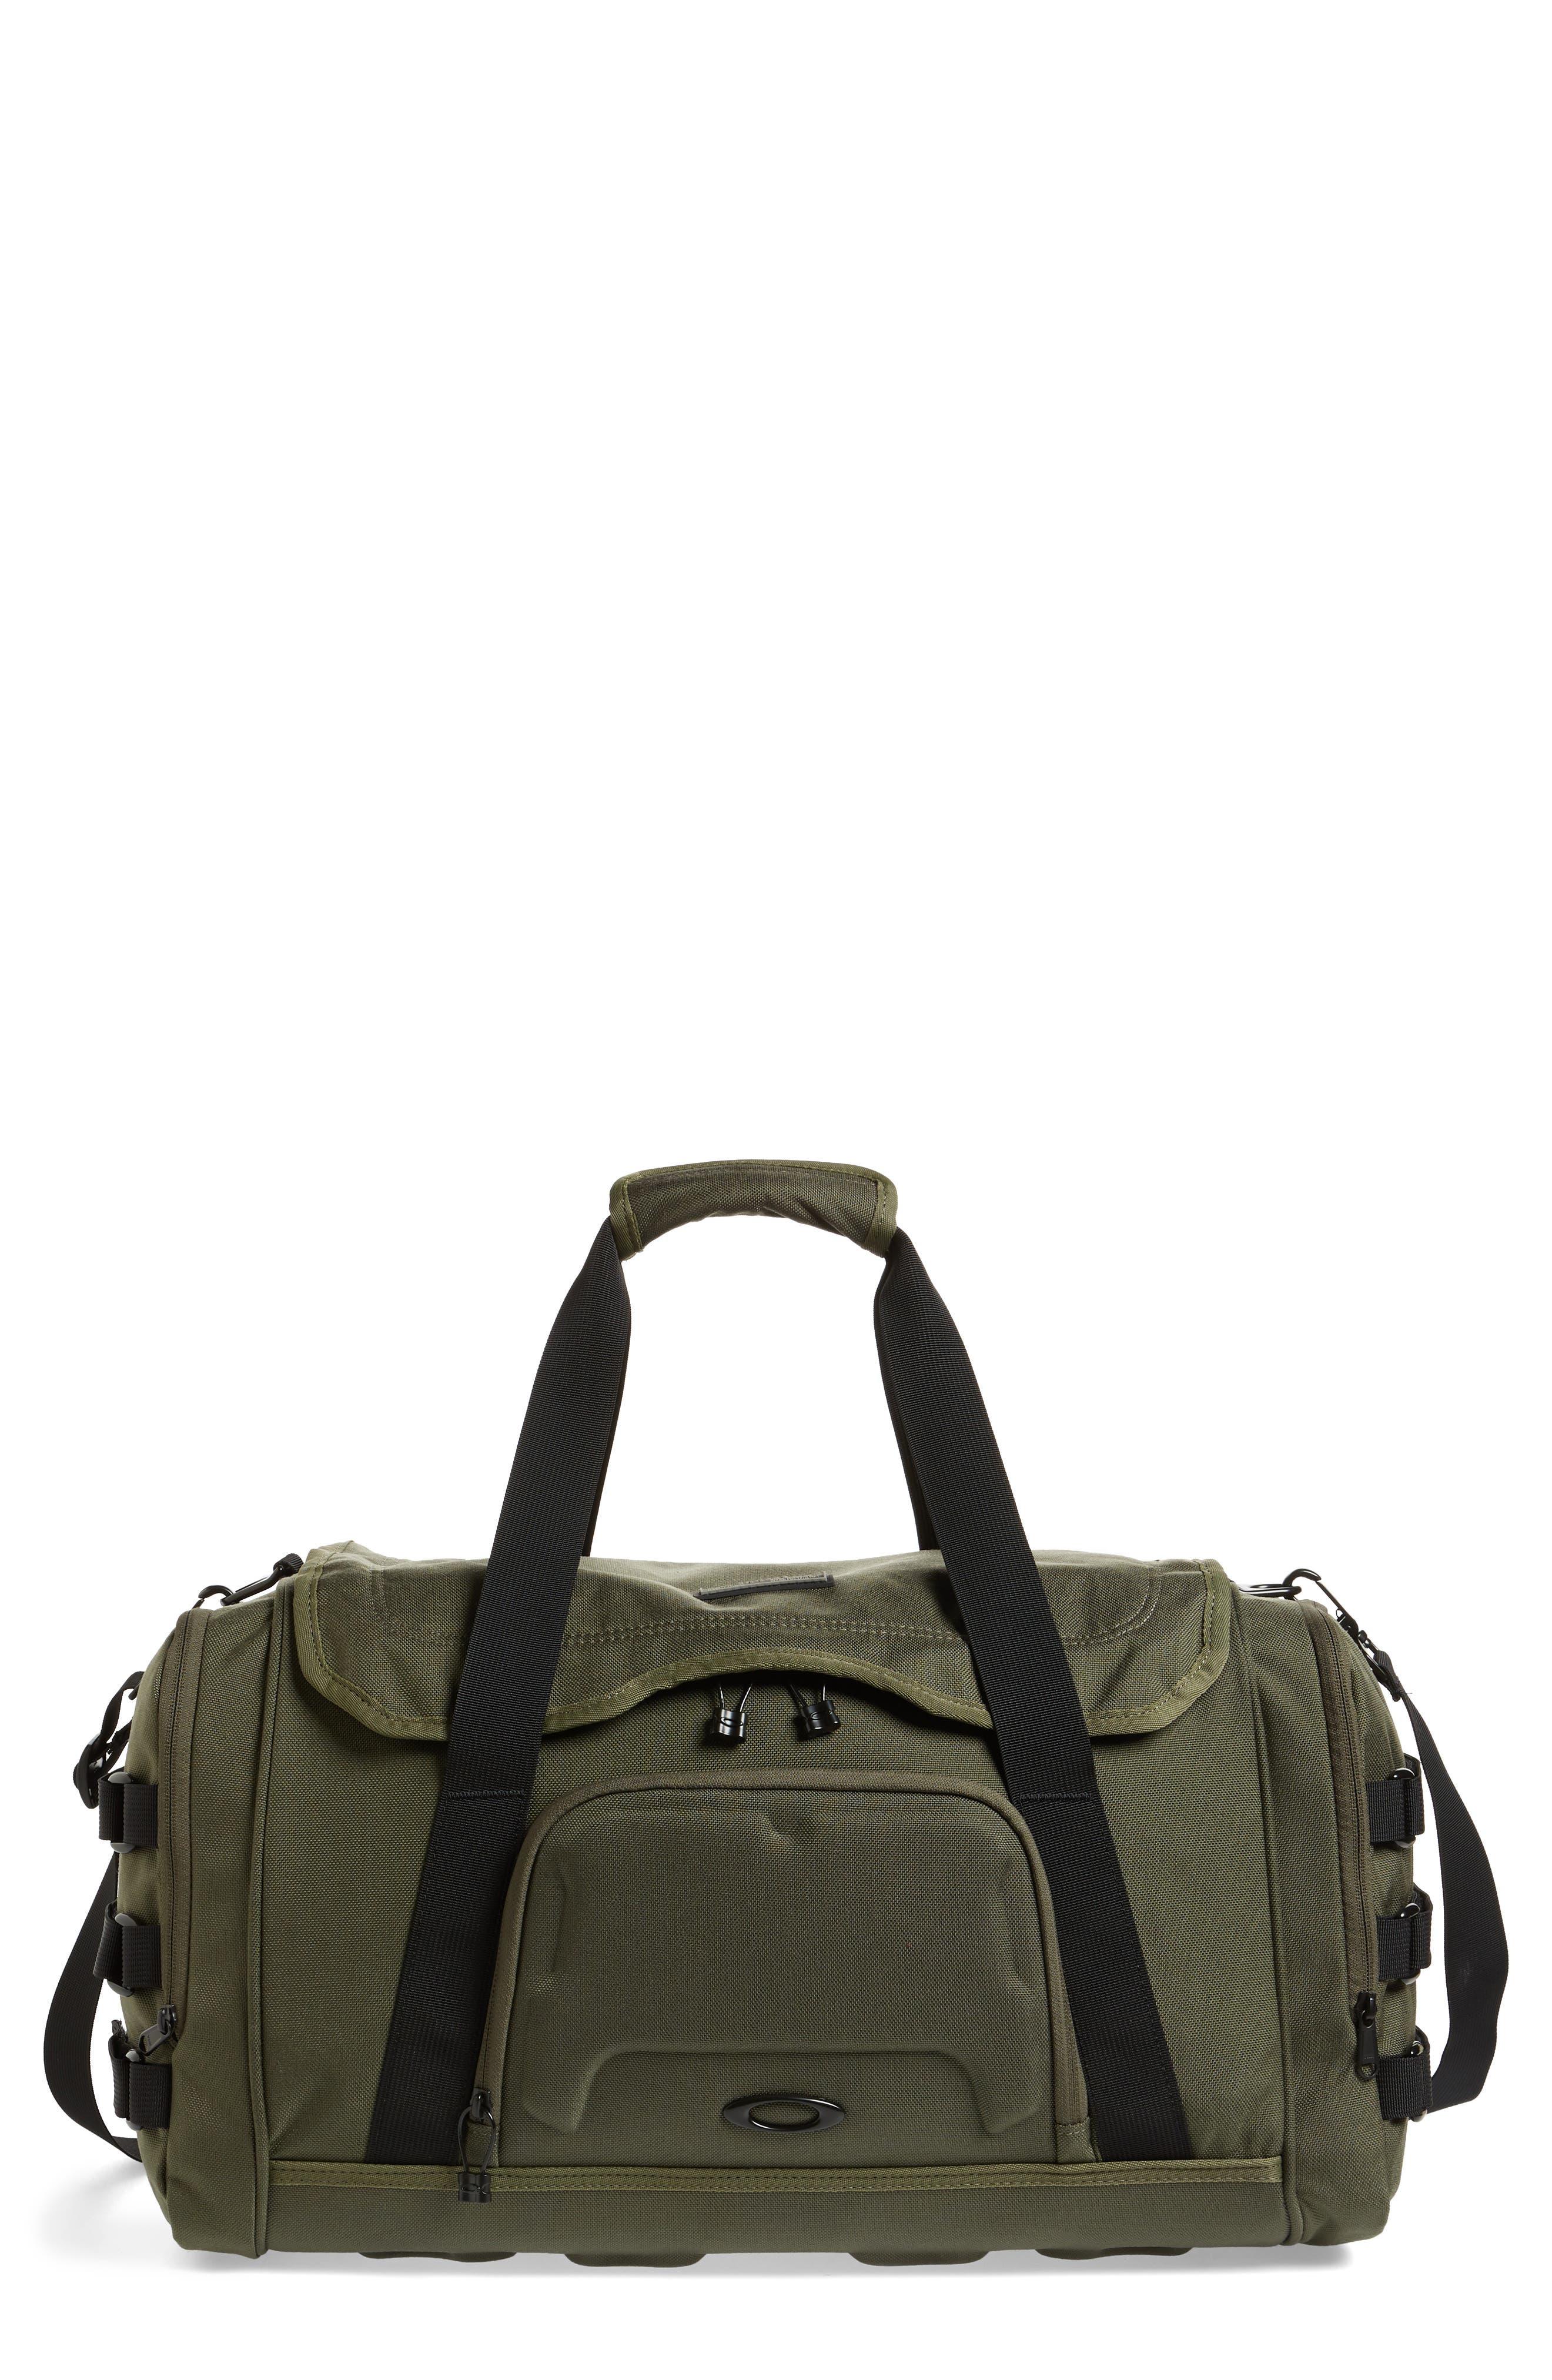 OAKLEY,                             Icon Duffel Bag,                             Main thumbnail 1, color,                             DARK BRUSH